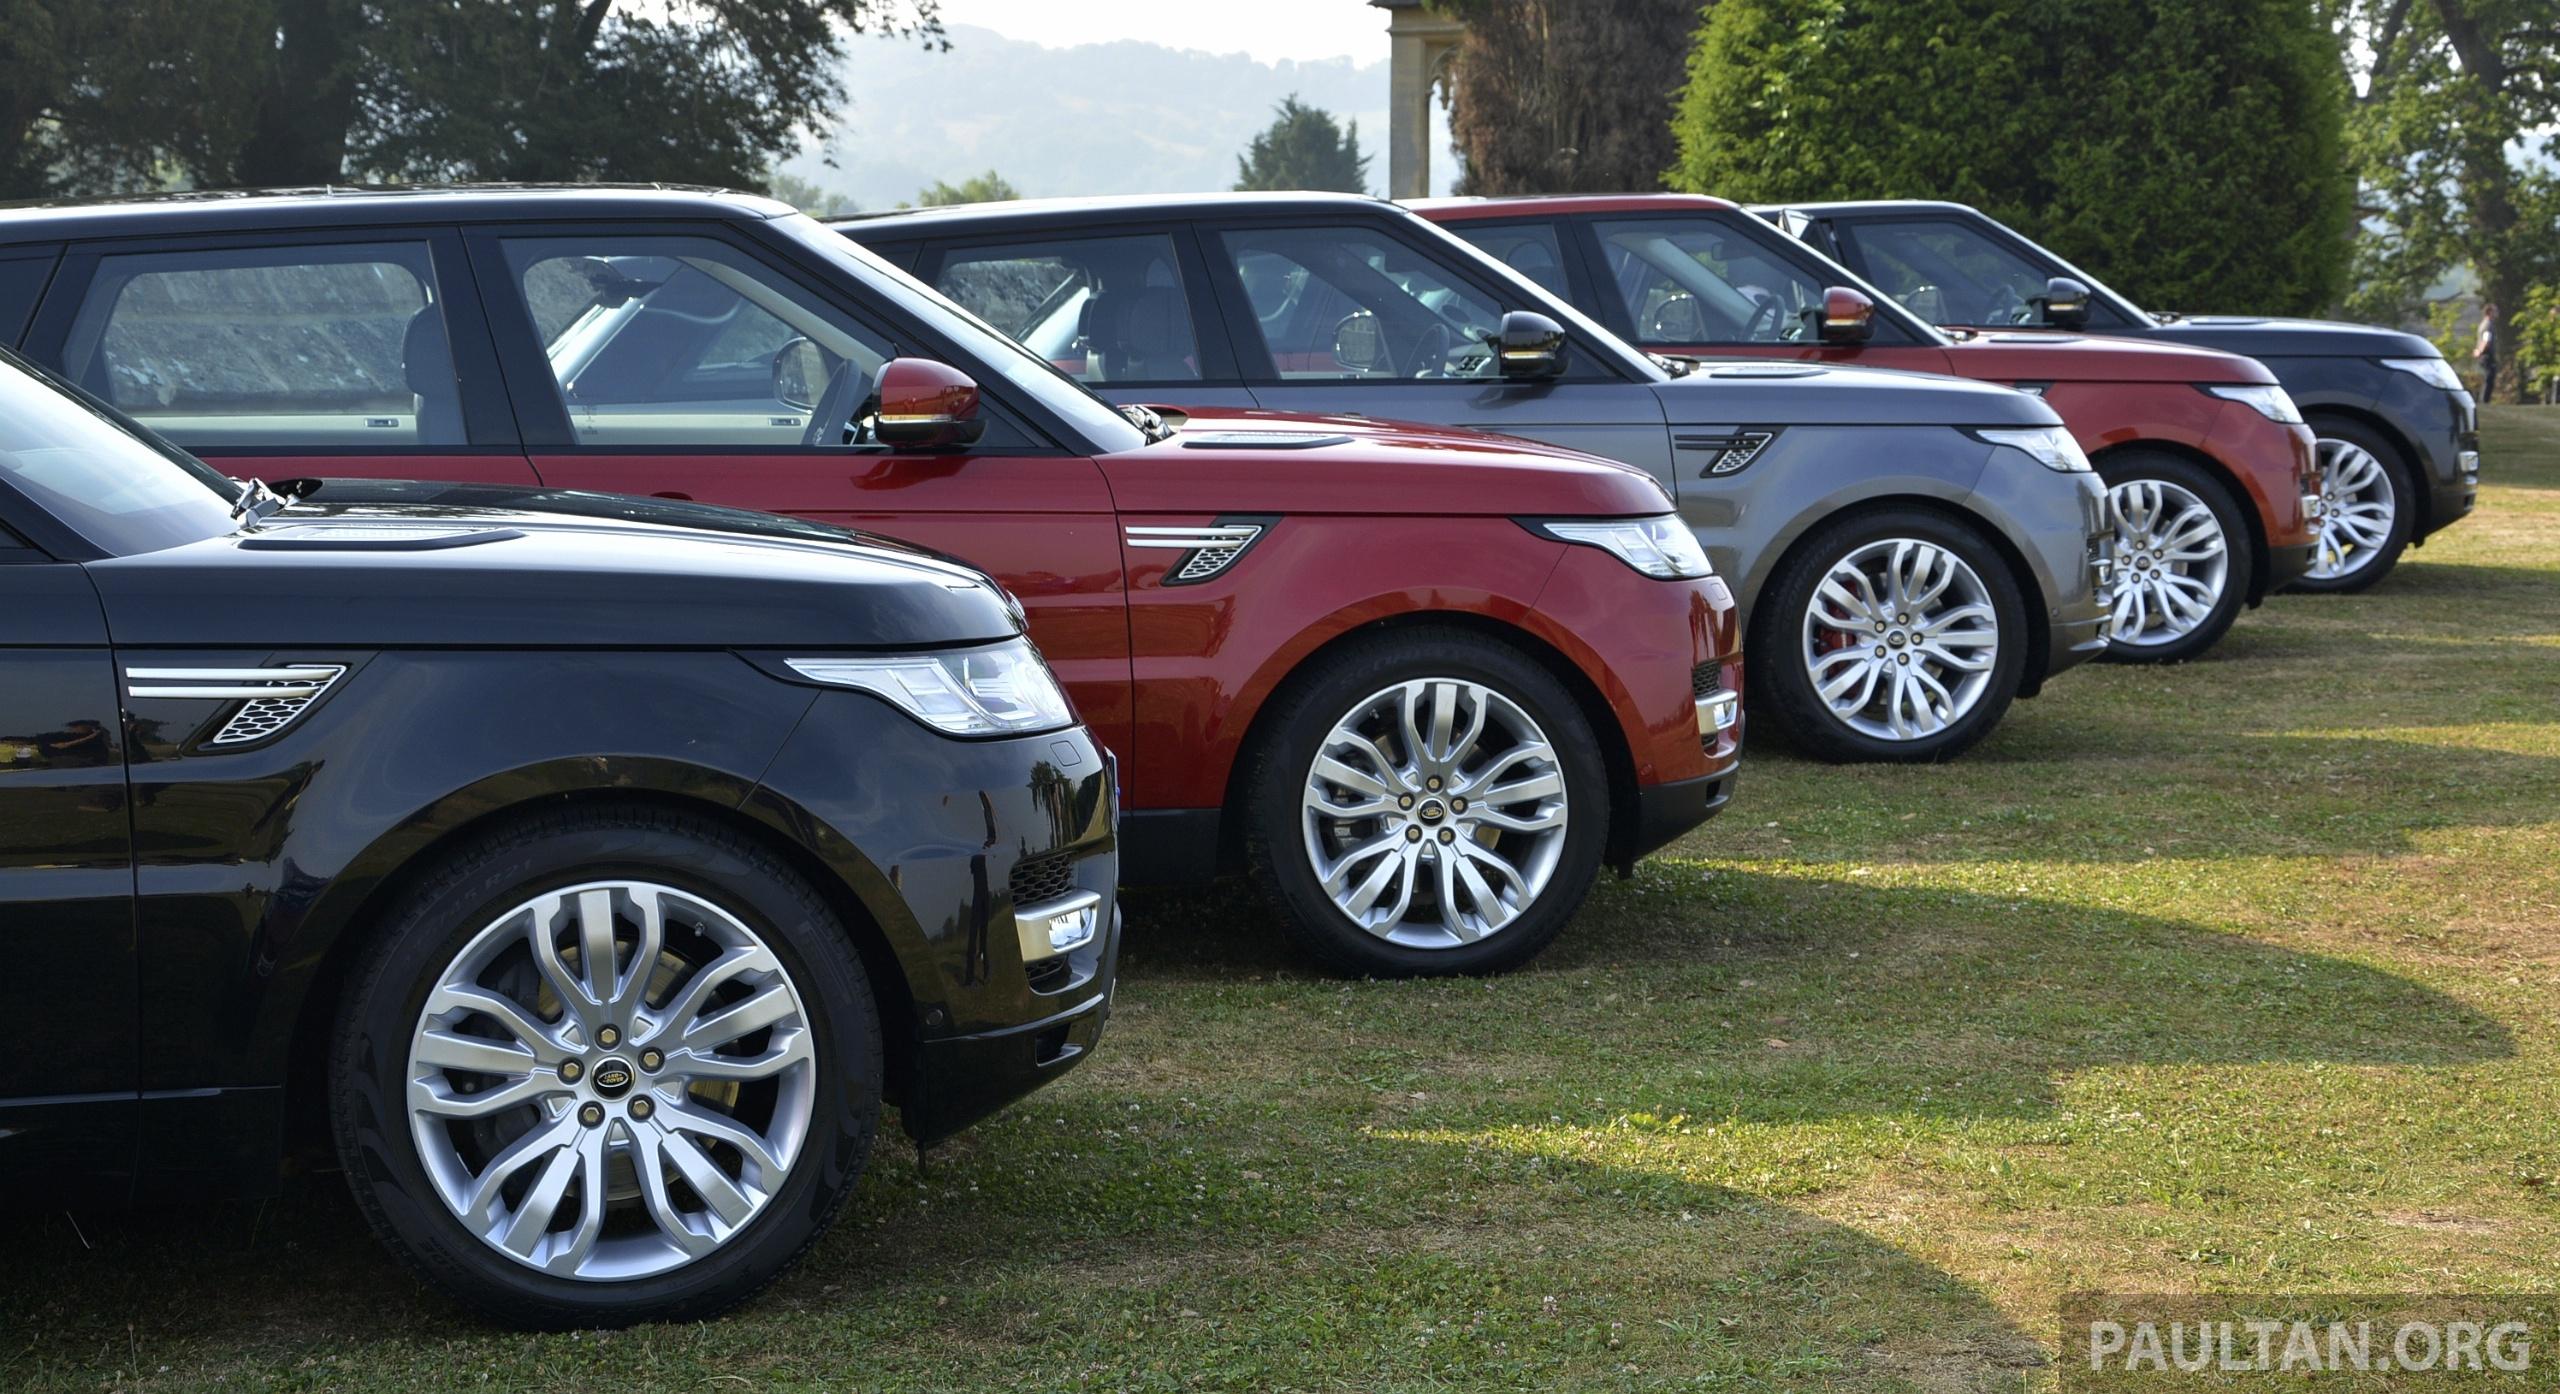 Dodge Power Wagon For Sale Near Me >> Range Rover Sport 2018 | Best Car Specs & Models